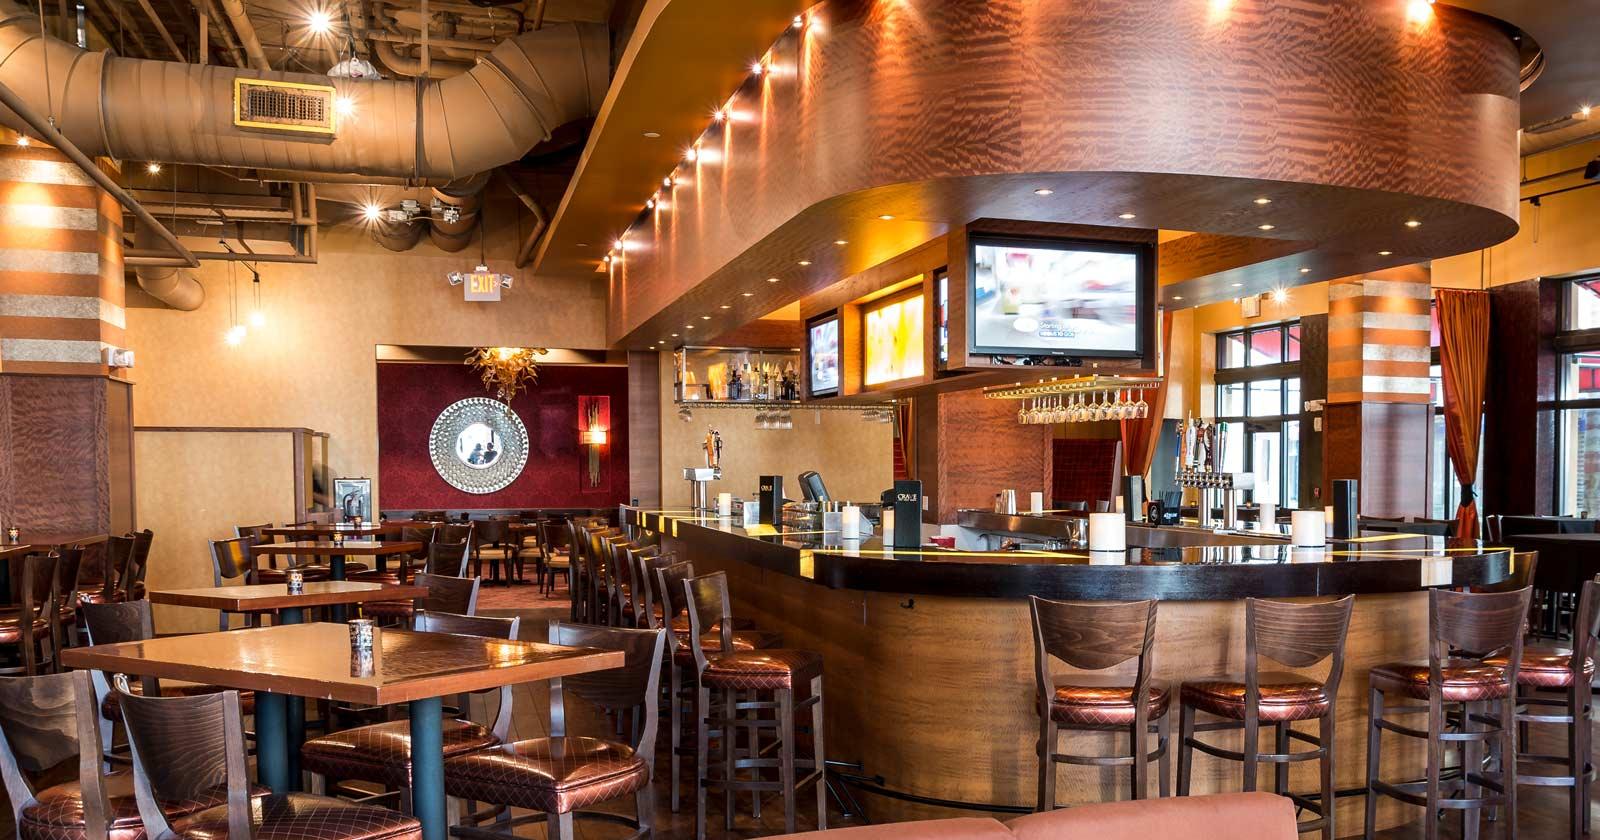 Hilton Garden Inn - Sioux Falls South Dakota | Crave American ...